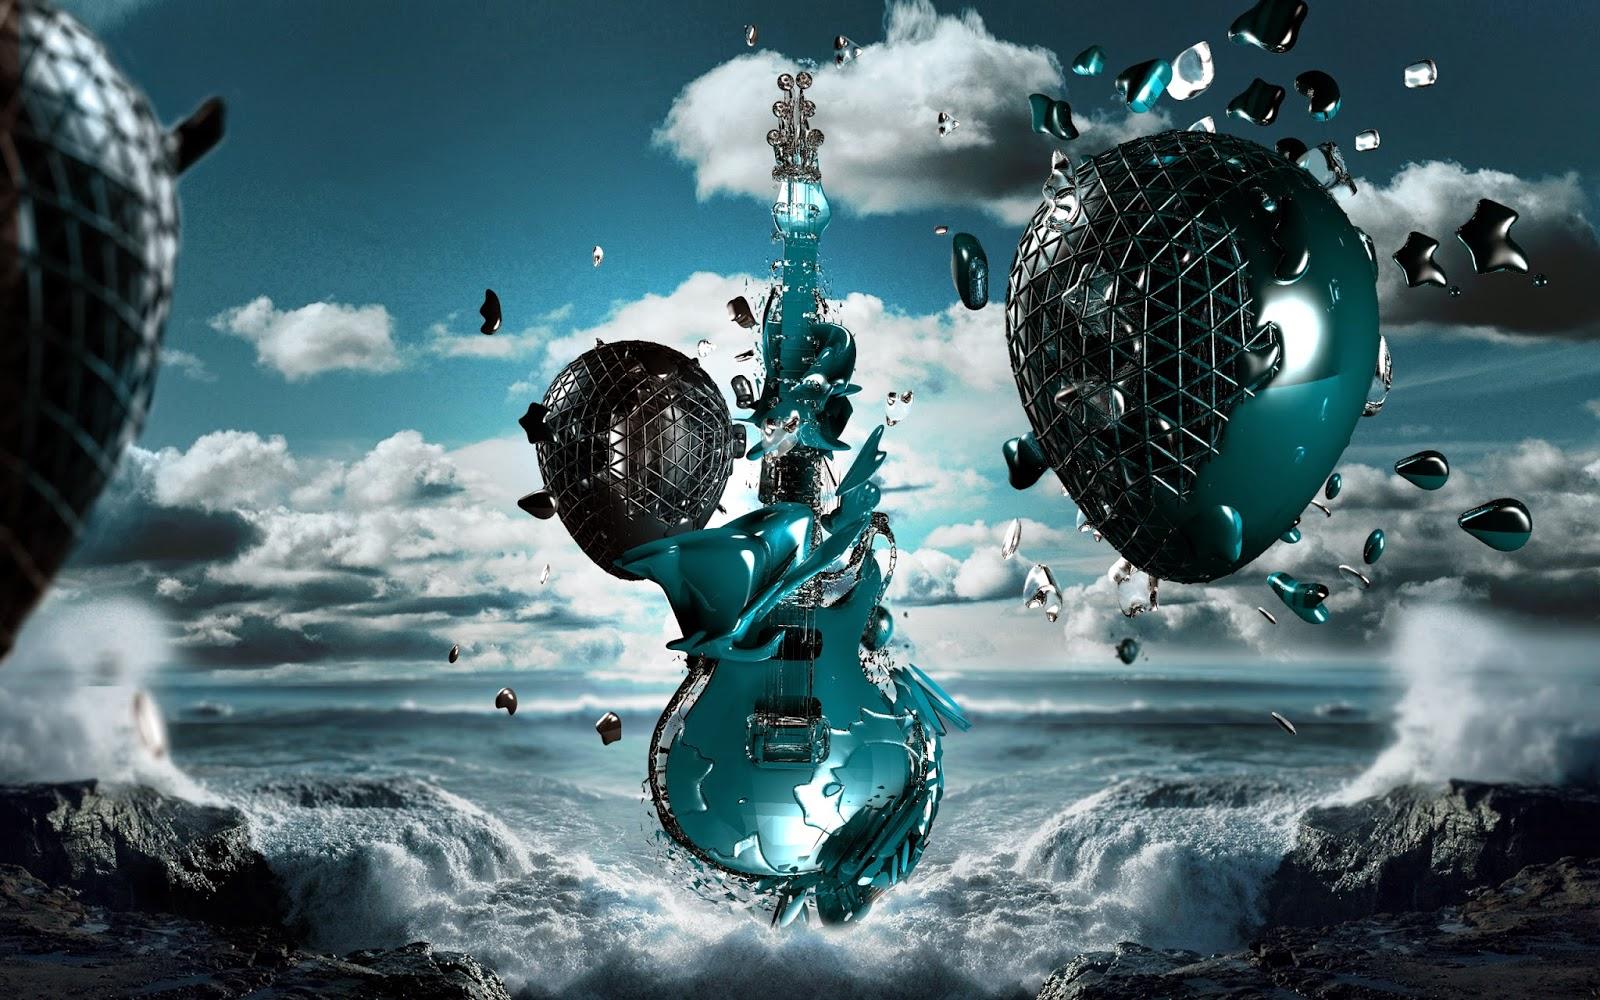 Hình Nền Đẹp - Guitar